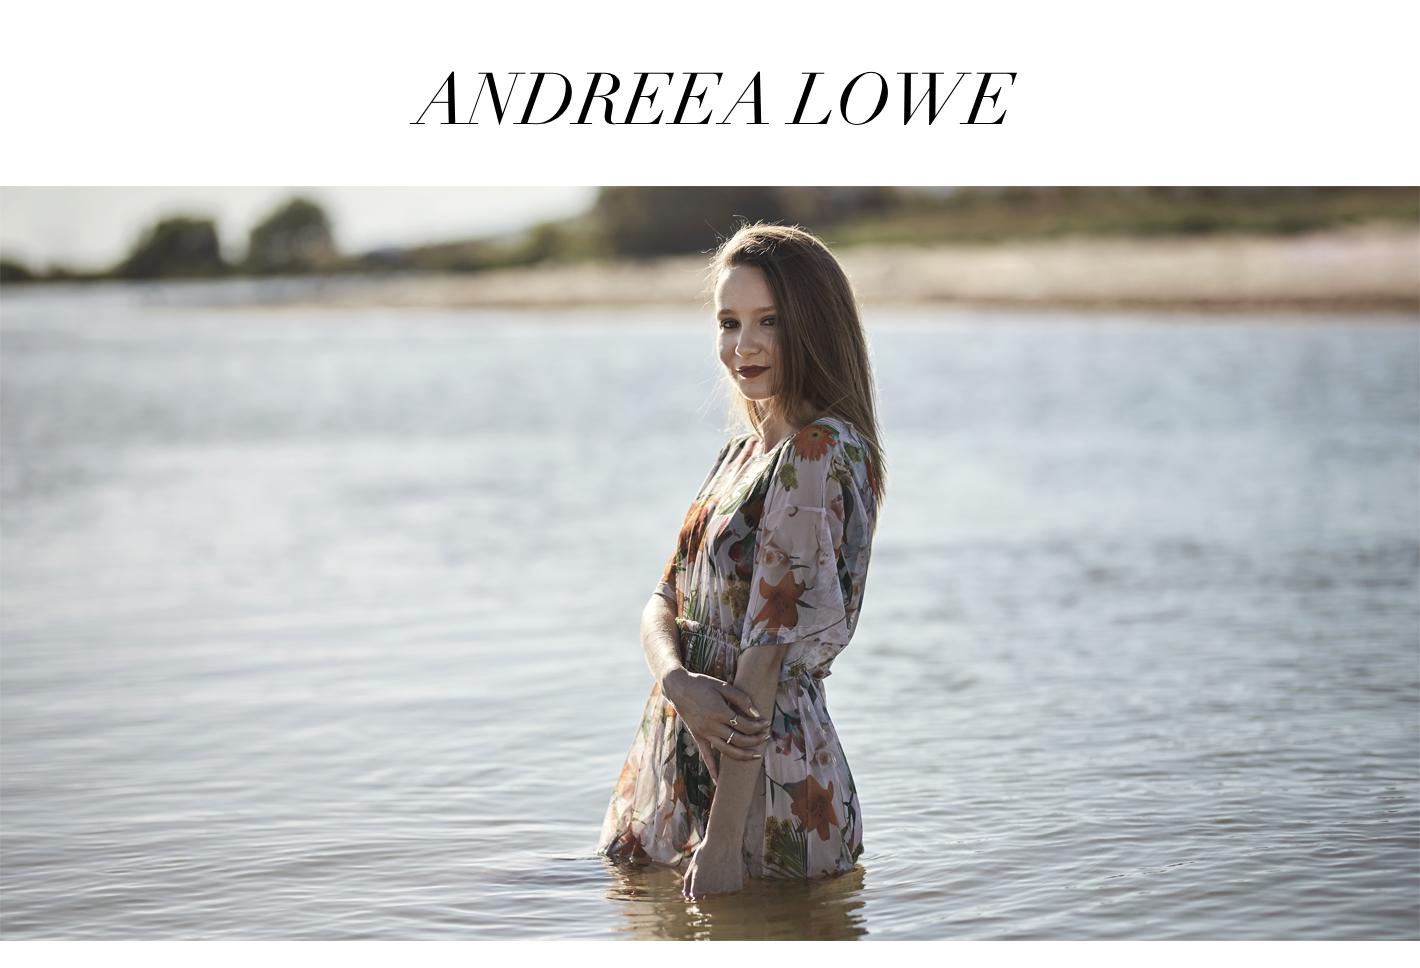 Andreea Lowe